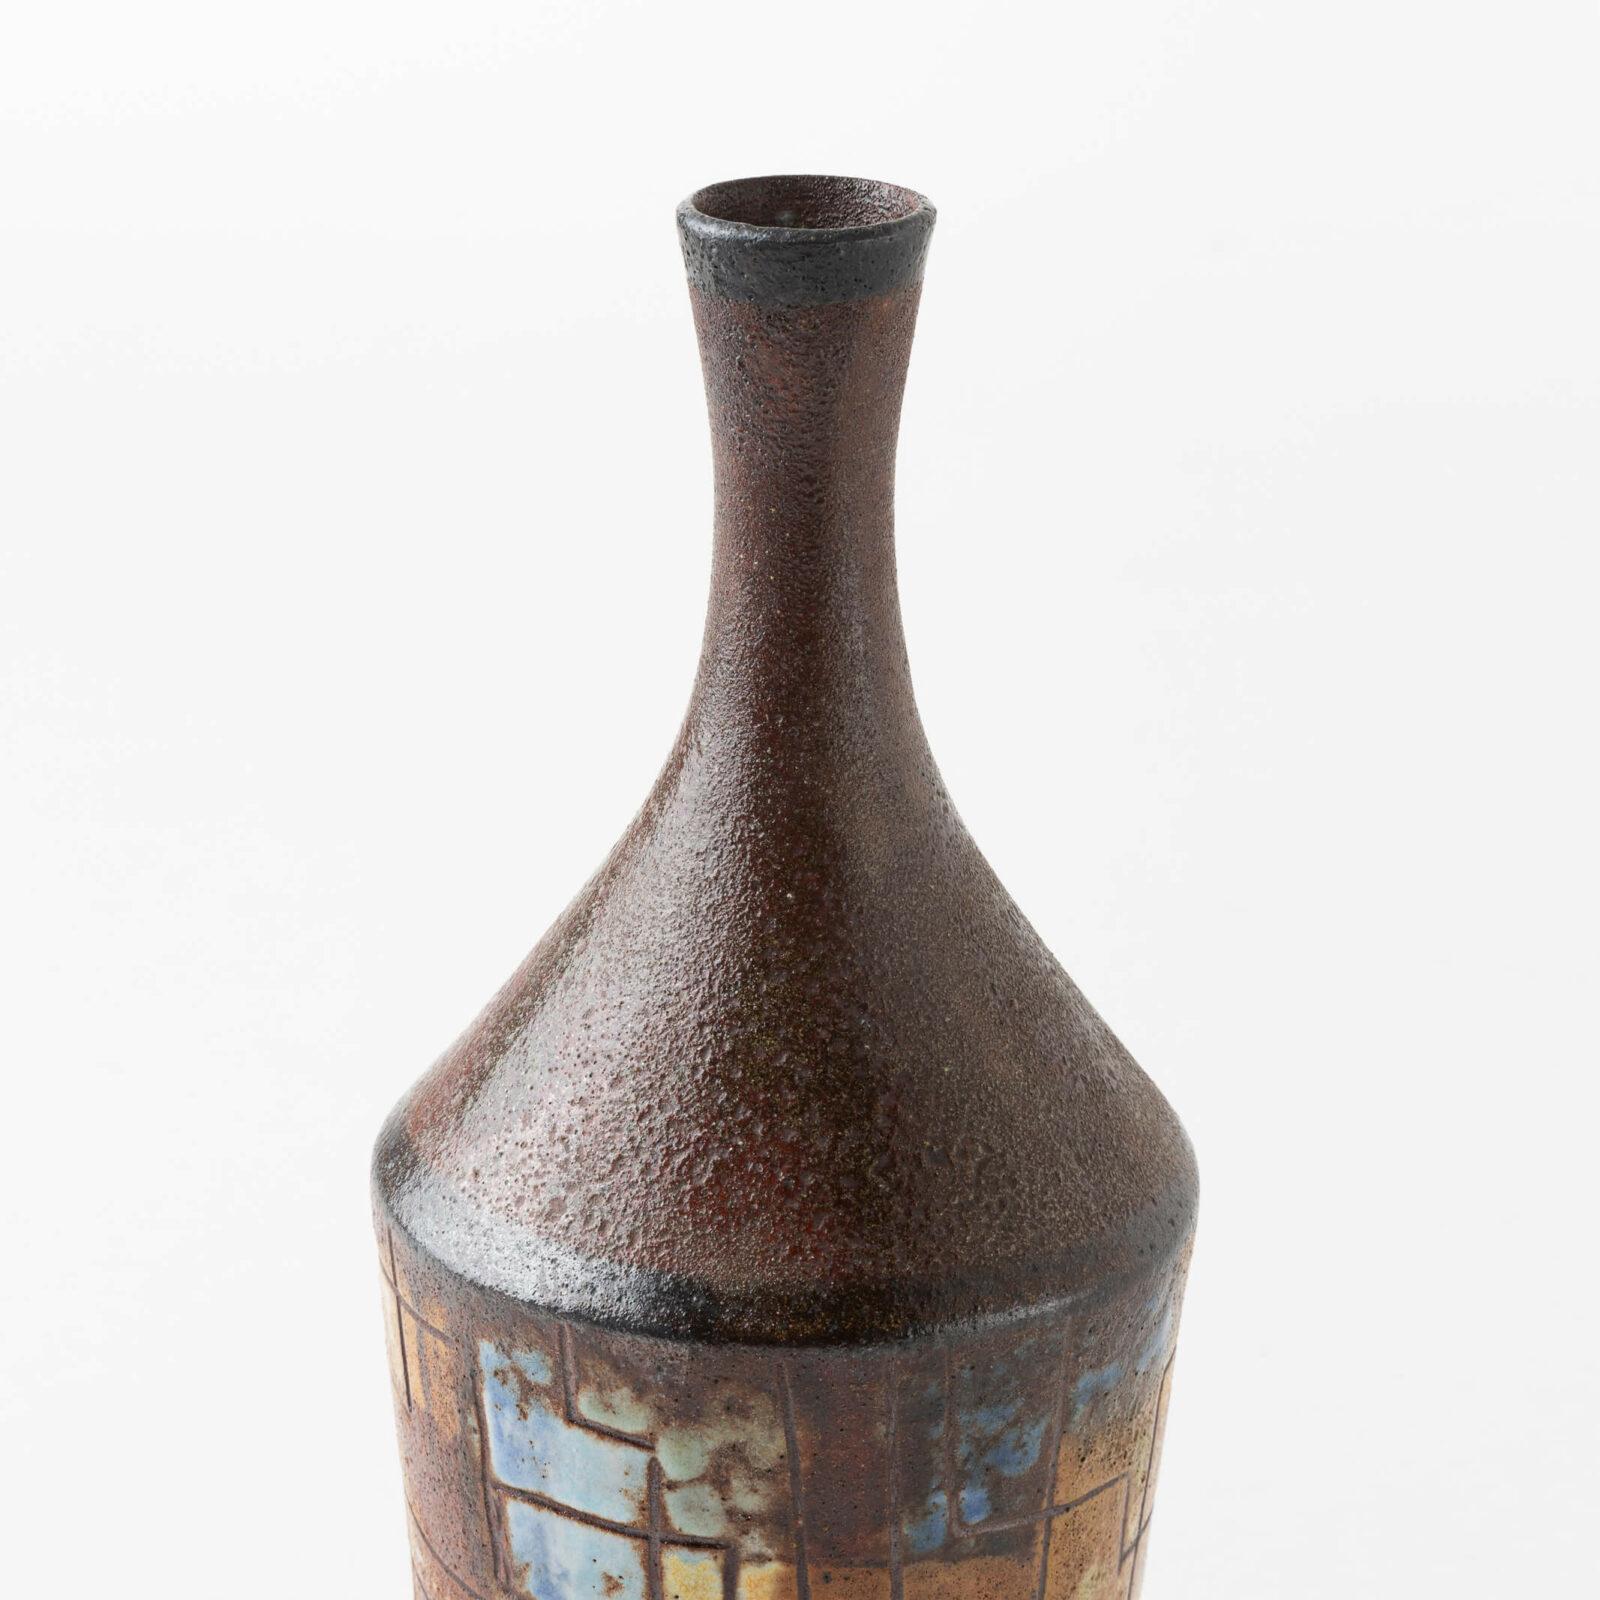 Pair of Bottle-shaped Vases